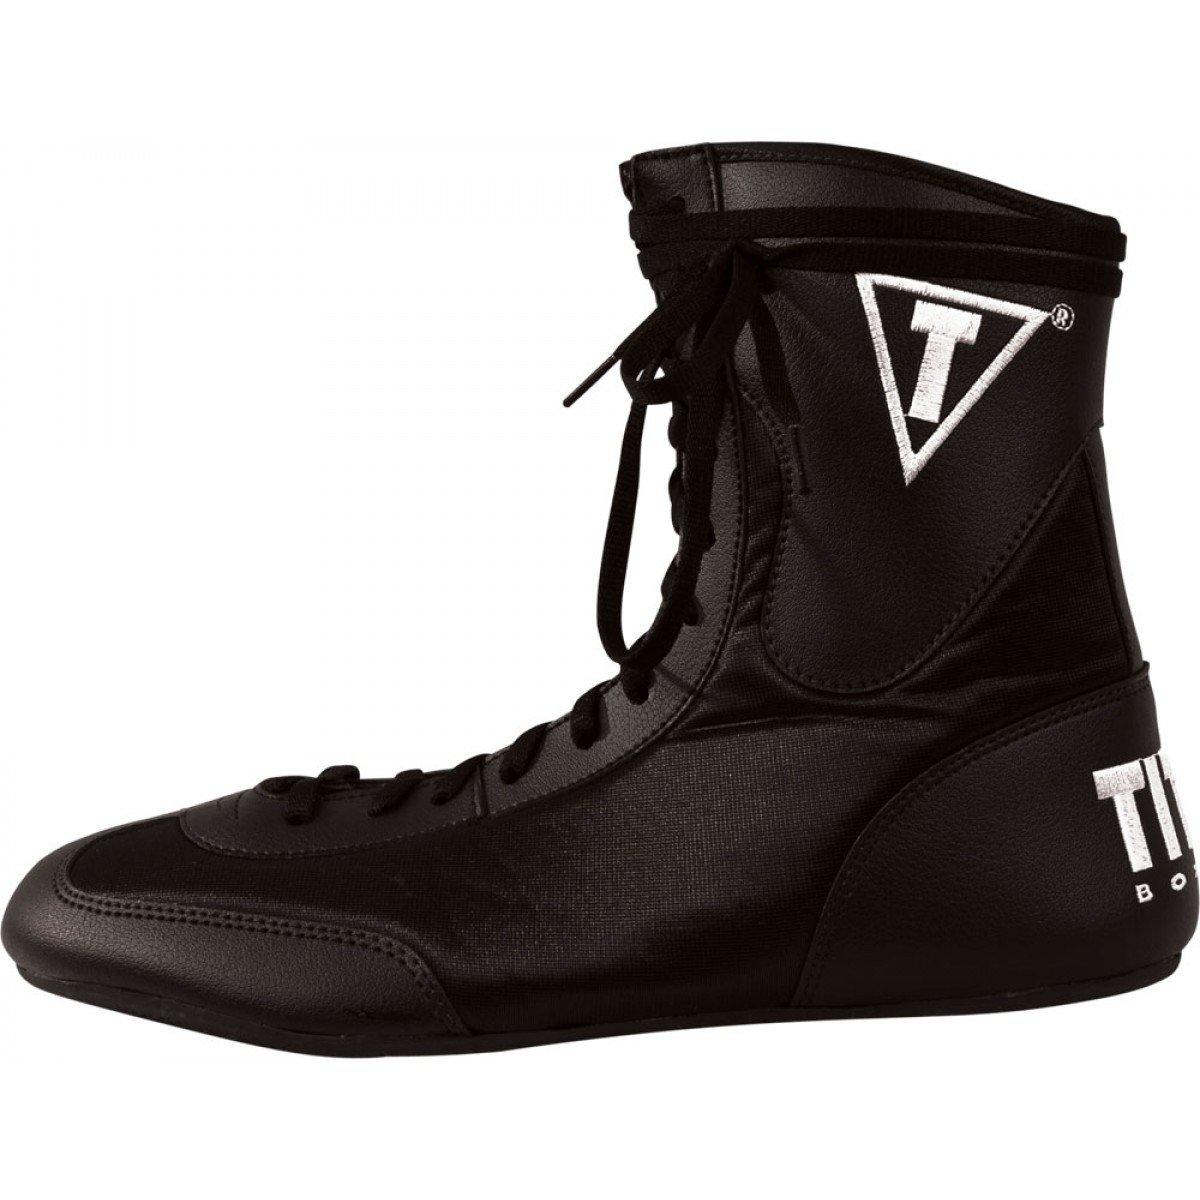 TITLE スピード-フレックス アンコールミドルボクシングシューズ B01NCPZ2VQ ブラック 8